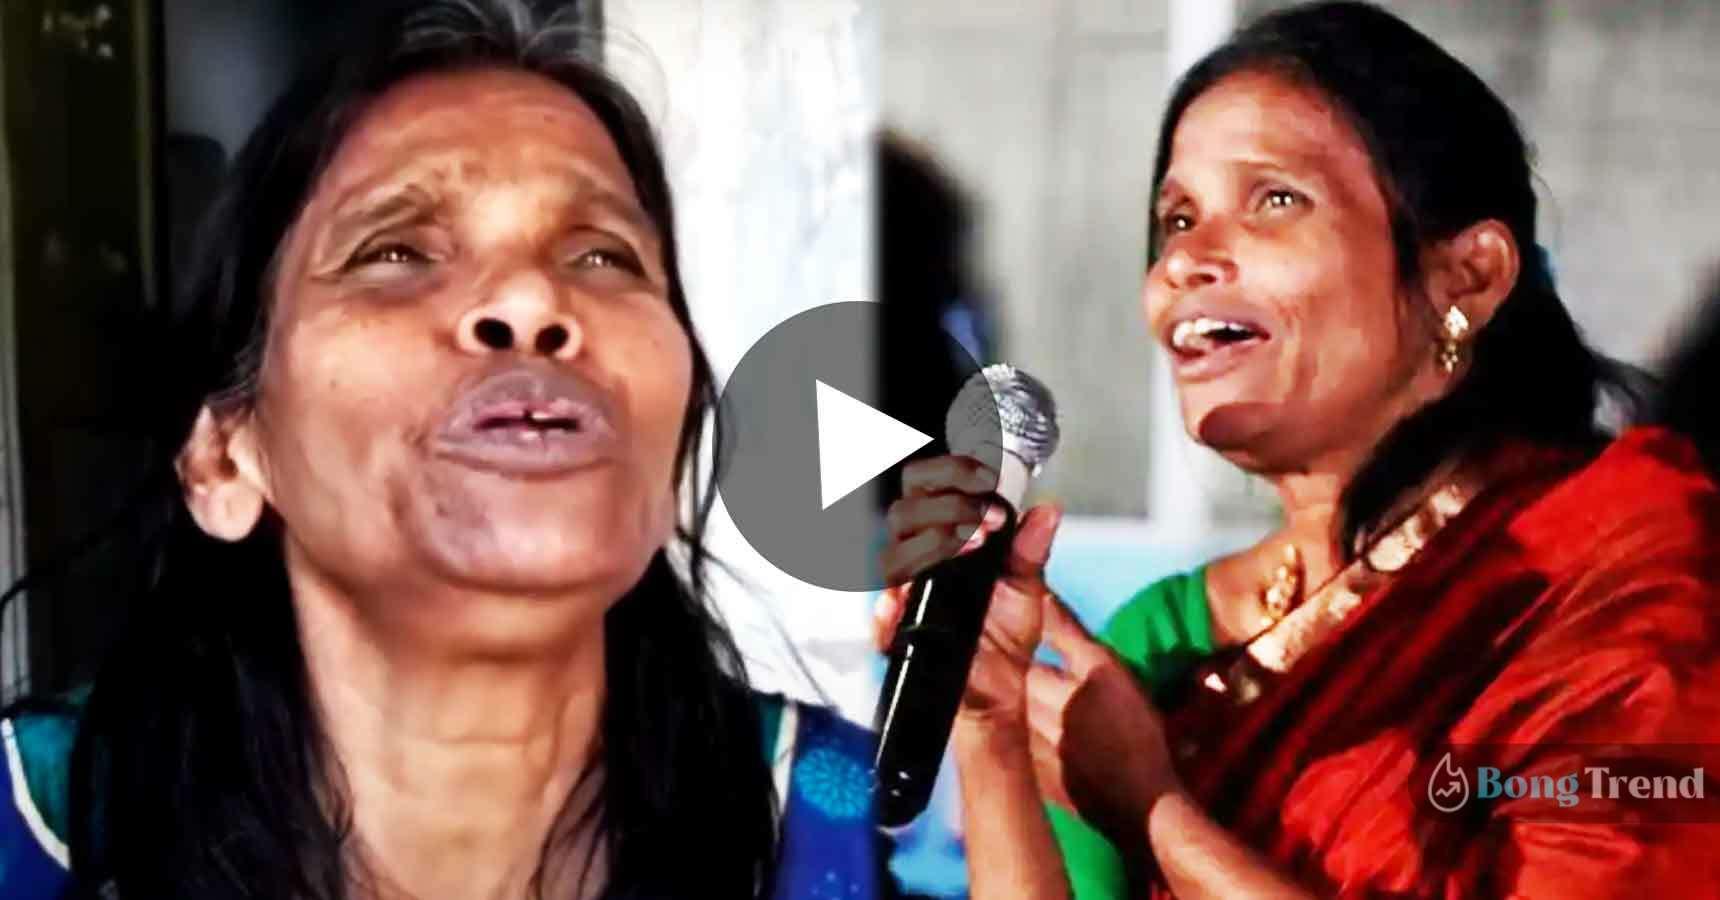 Photo of খালি গলায় 'টুম্পা সোনা' গাইছেন রানাঘাটের রানু মন্ডল, শেয়ার হতেই ভিডিও ভাইরাল নেটপাড়ায়